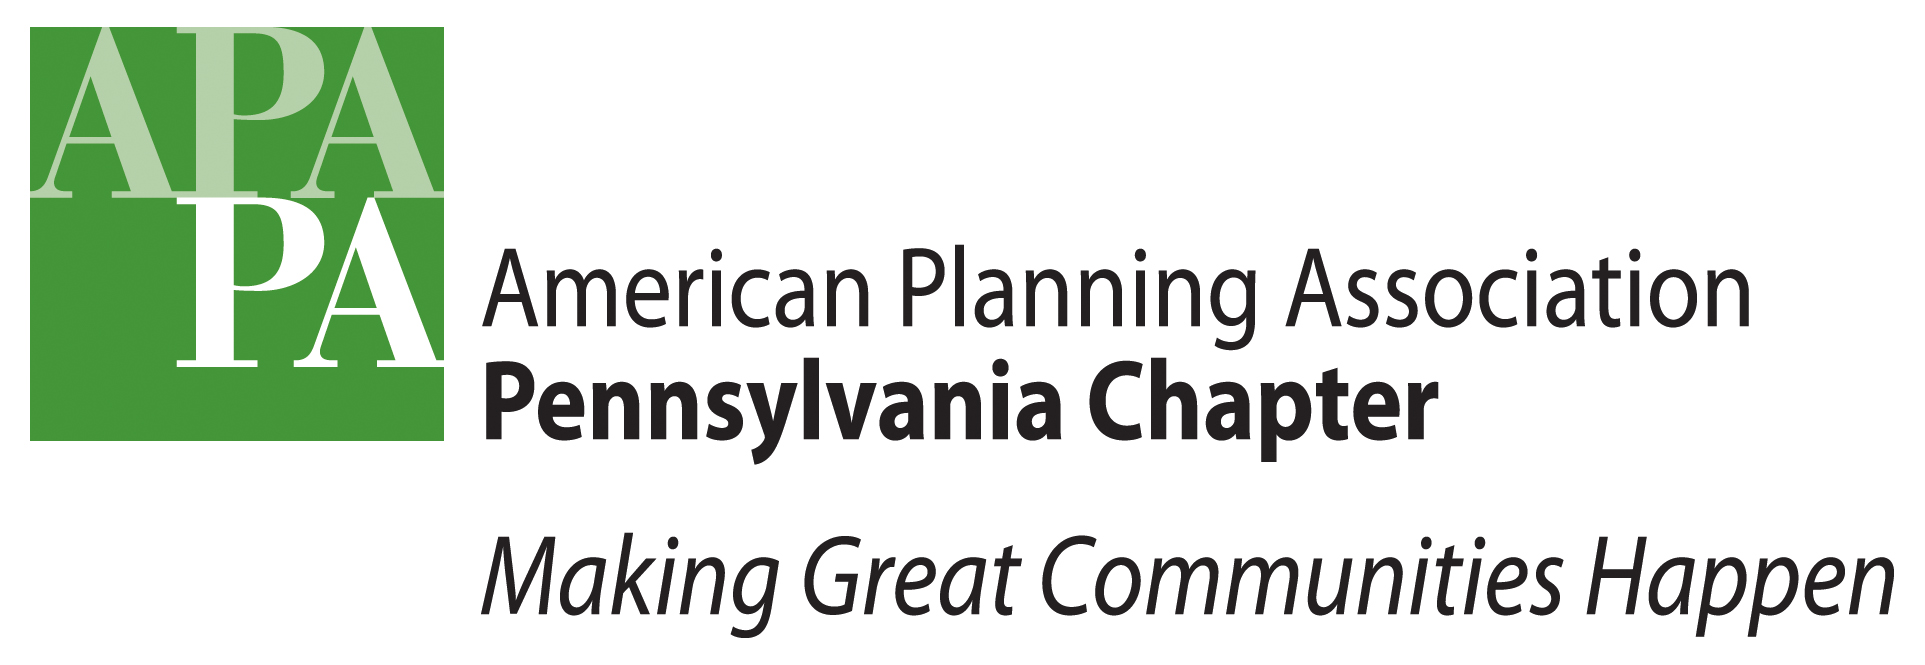 2019 APA PA Annual Conference